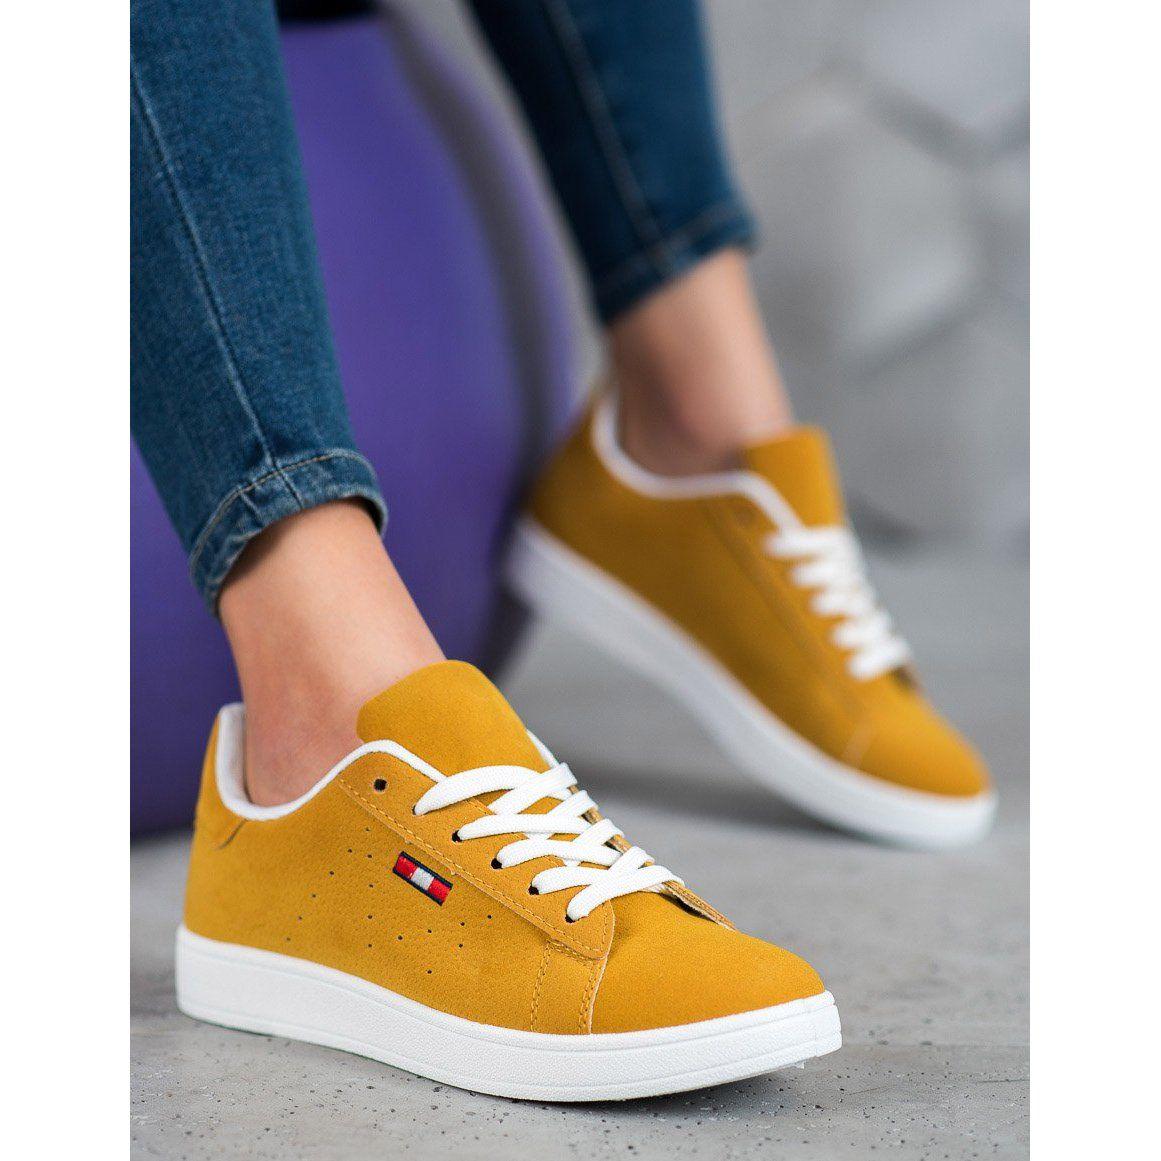 Shelovet Wygodne Buty Z Eko Skory Zolte Shoes Sneakers Fashion